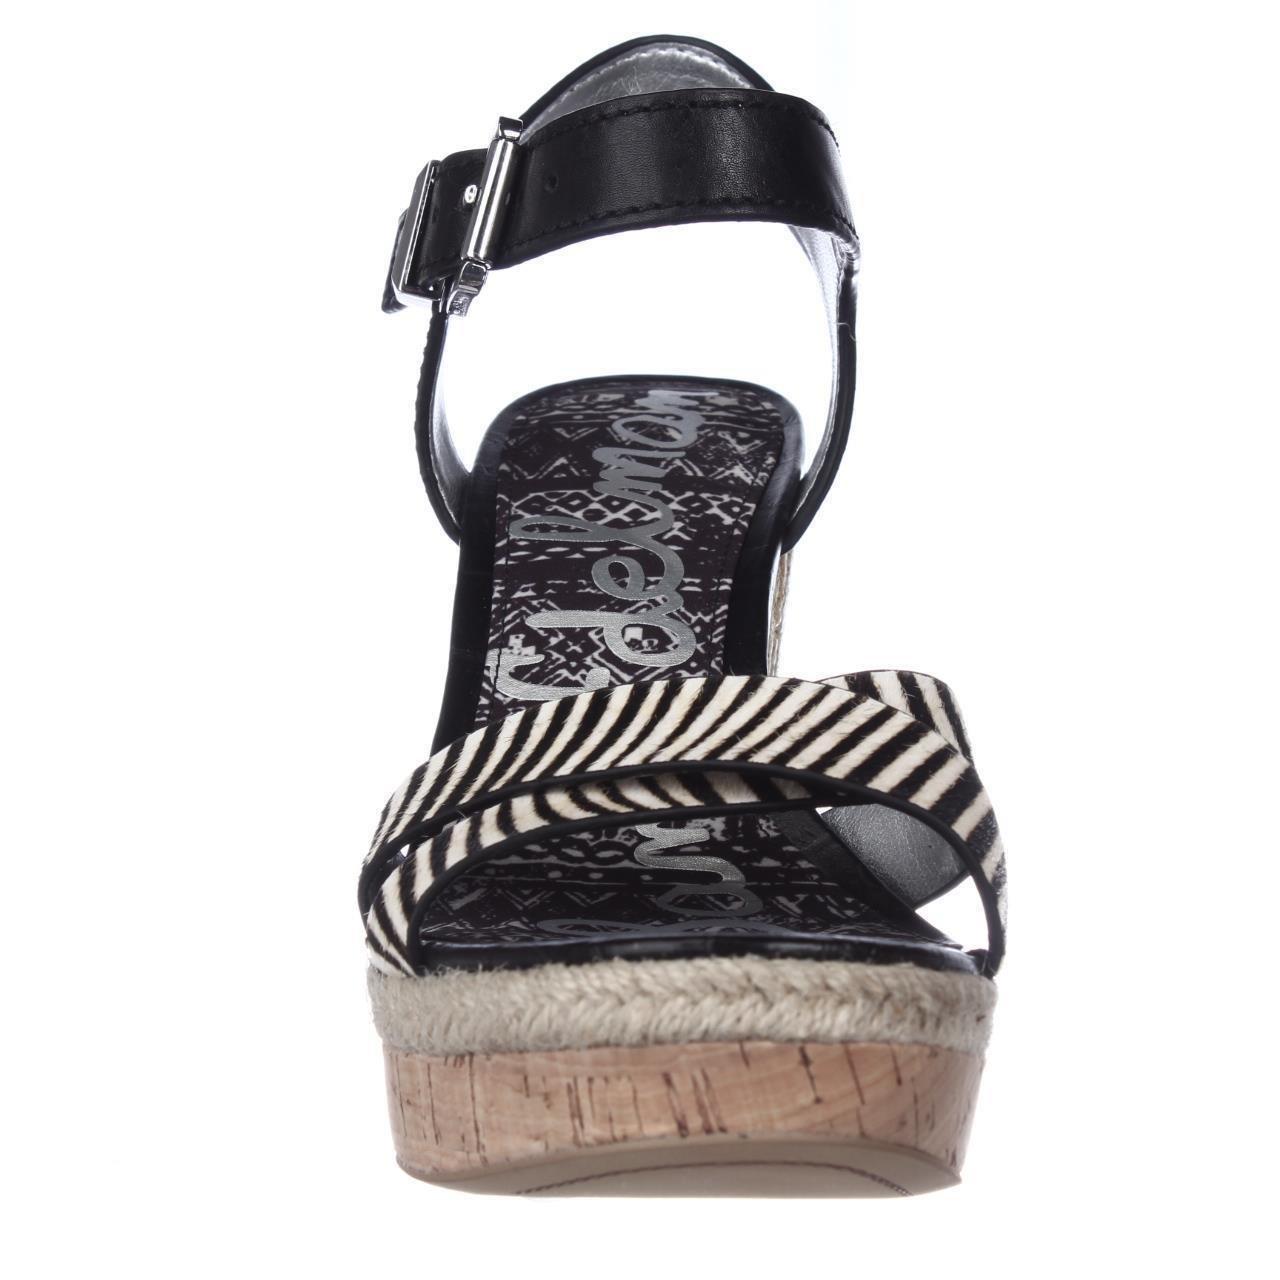 Sam Edelman Clay Suede Wedge Sandal Black Zebra 8.5 M